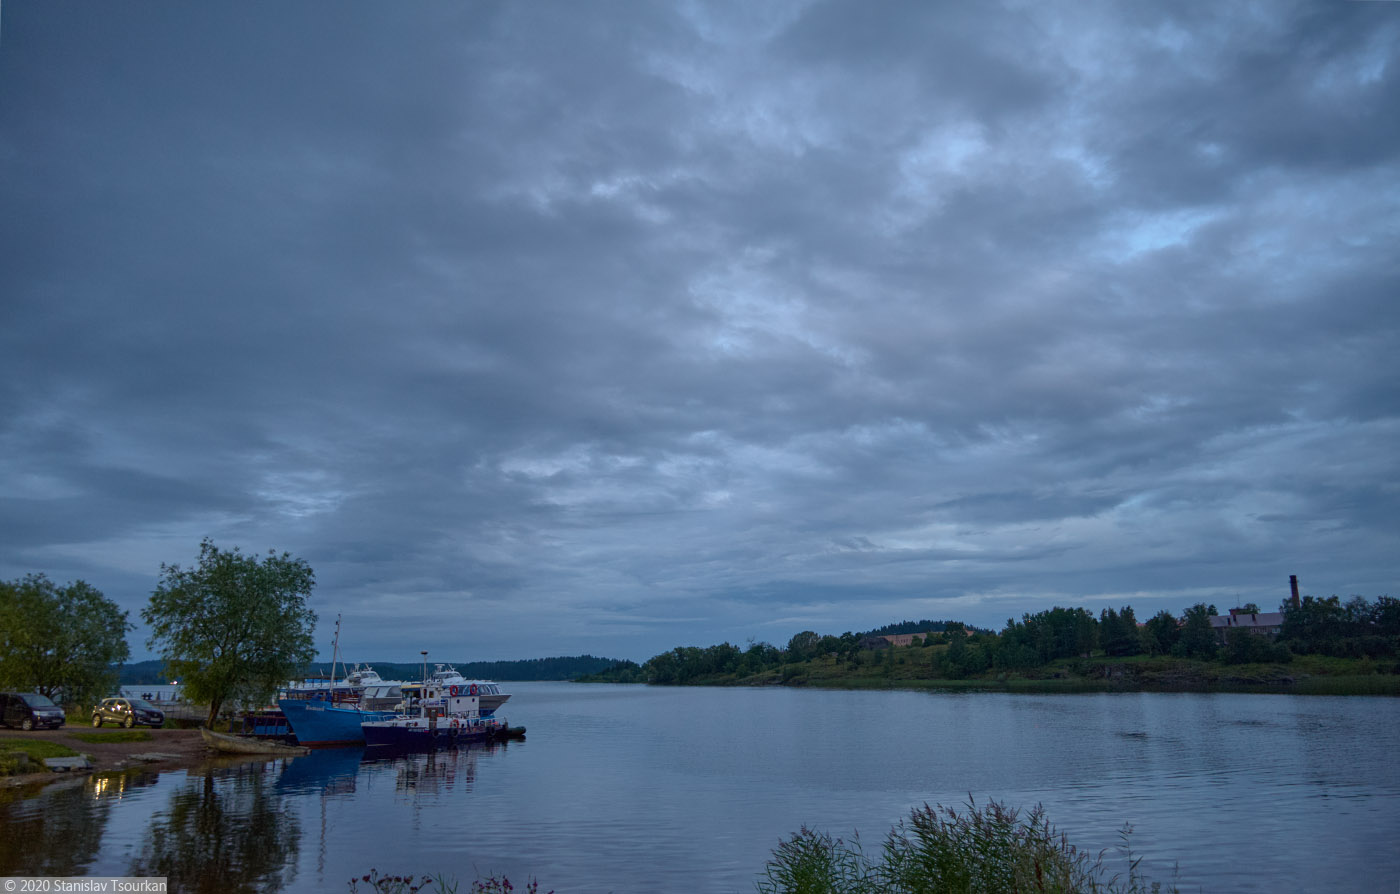 Сортавала, Карелия, республика Карелия, вечер, вечер в городе, Ляппяярви, причал, озеро